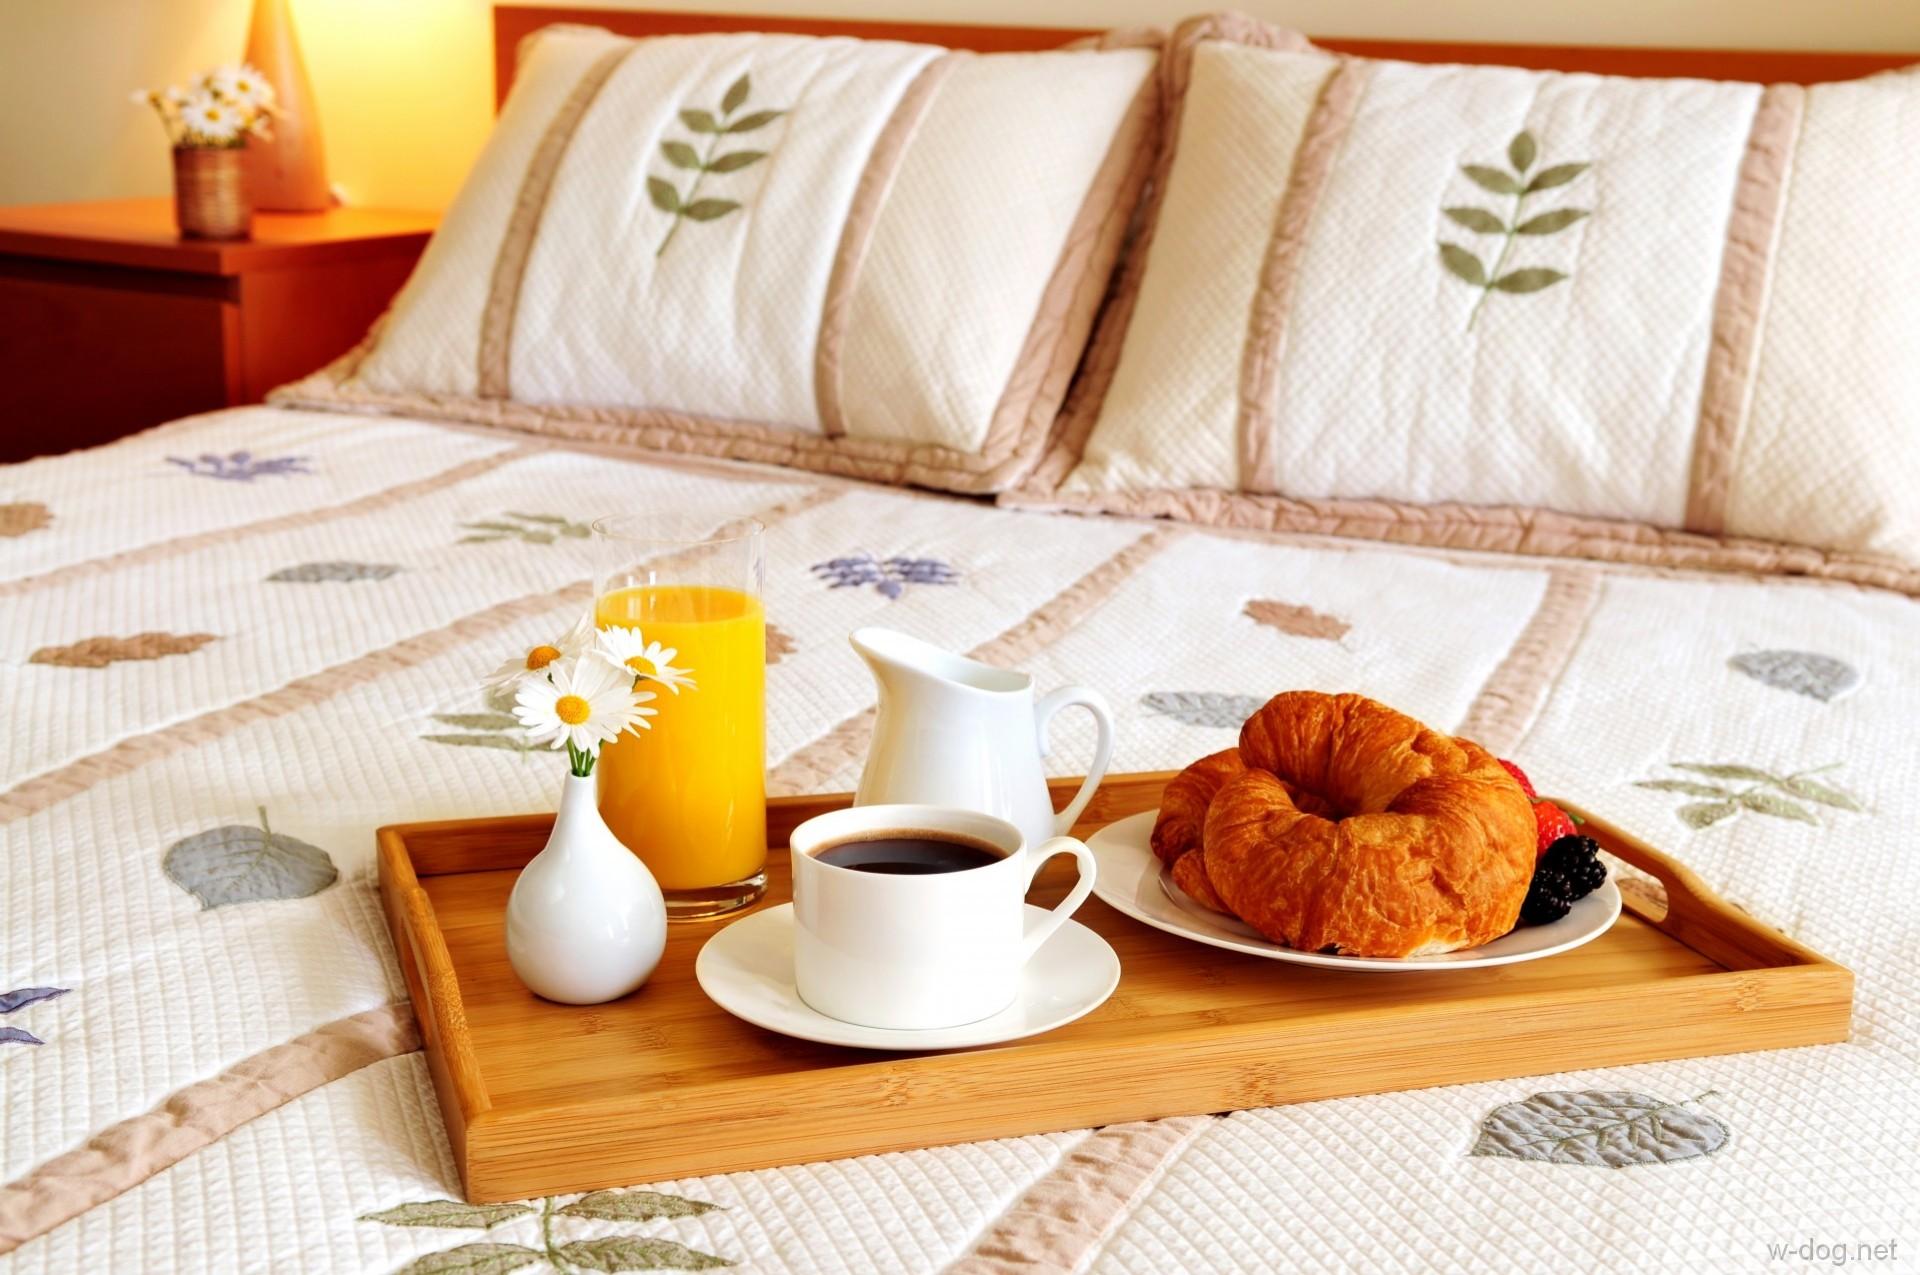 Картинки утренний завтрак на двоих, любаше